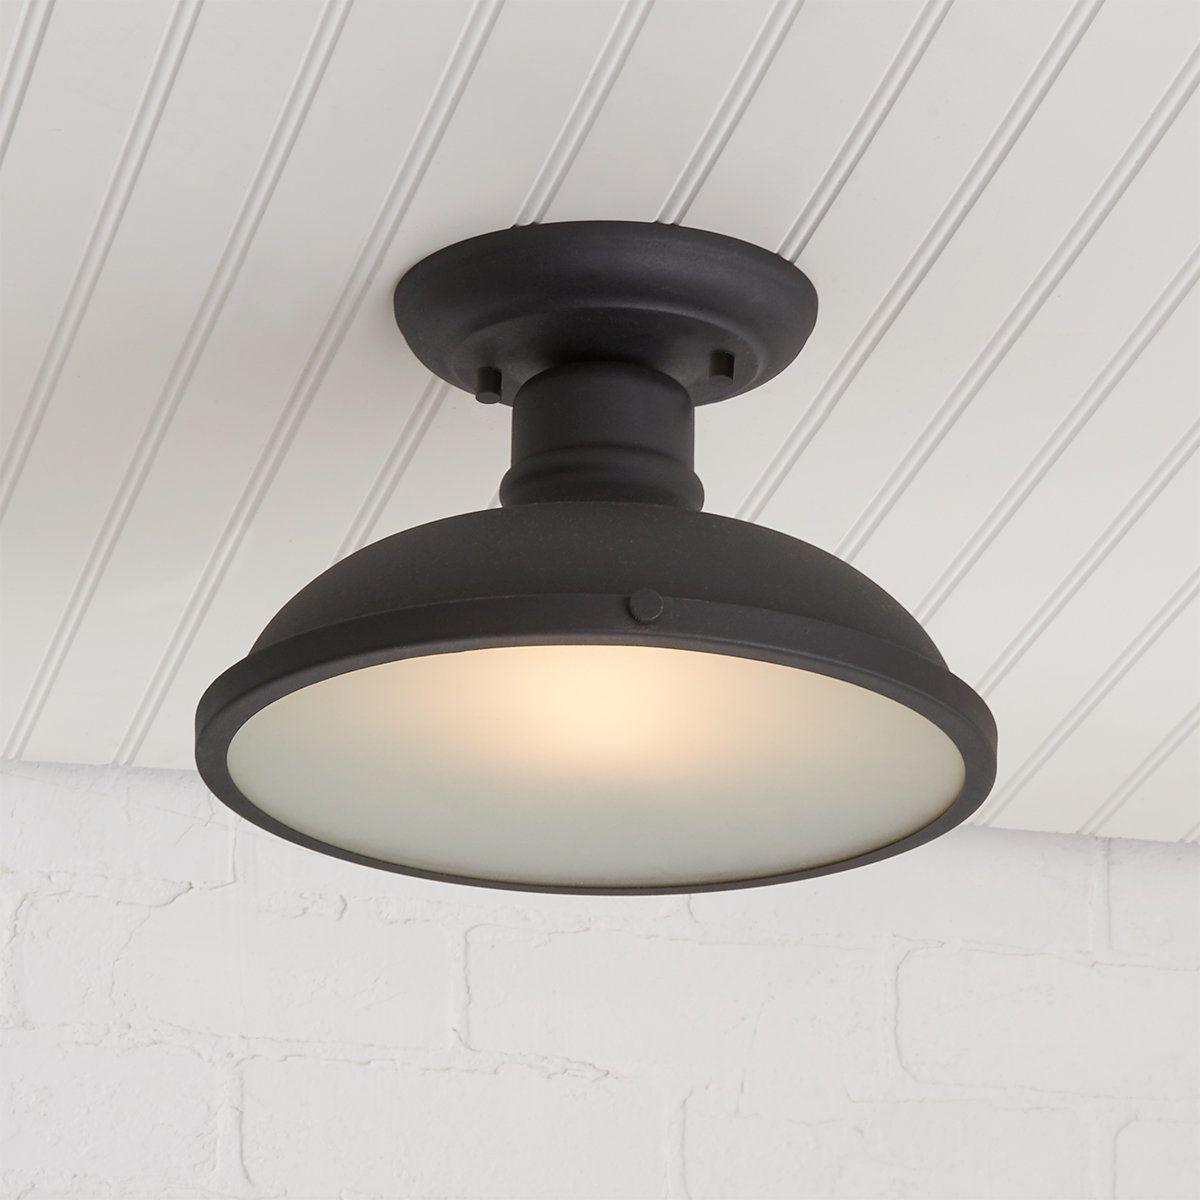 Sleek Workshop Outdoor Ceiling Light In 2020 Outdoor Ceiling Lights Ceiling Lights Semi Flush Ceiling Lights